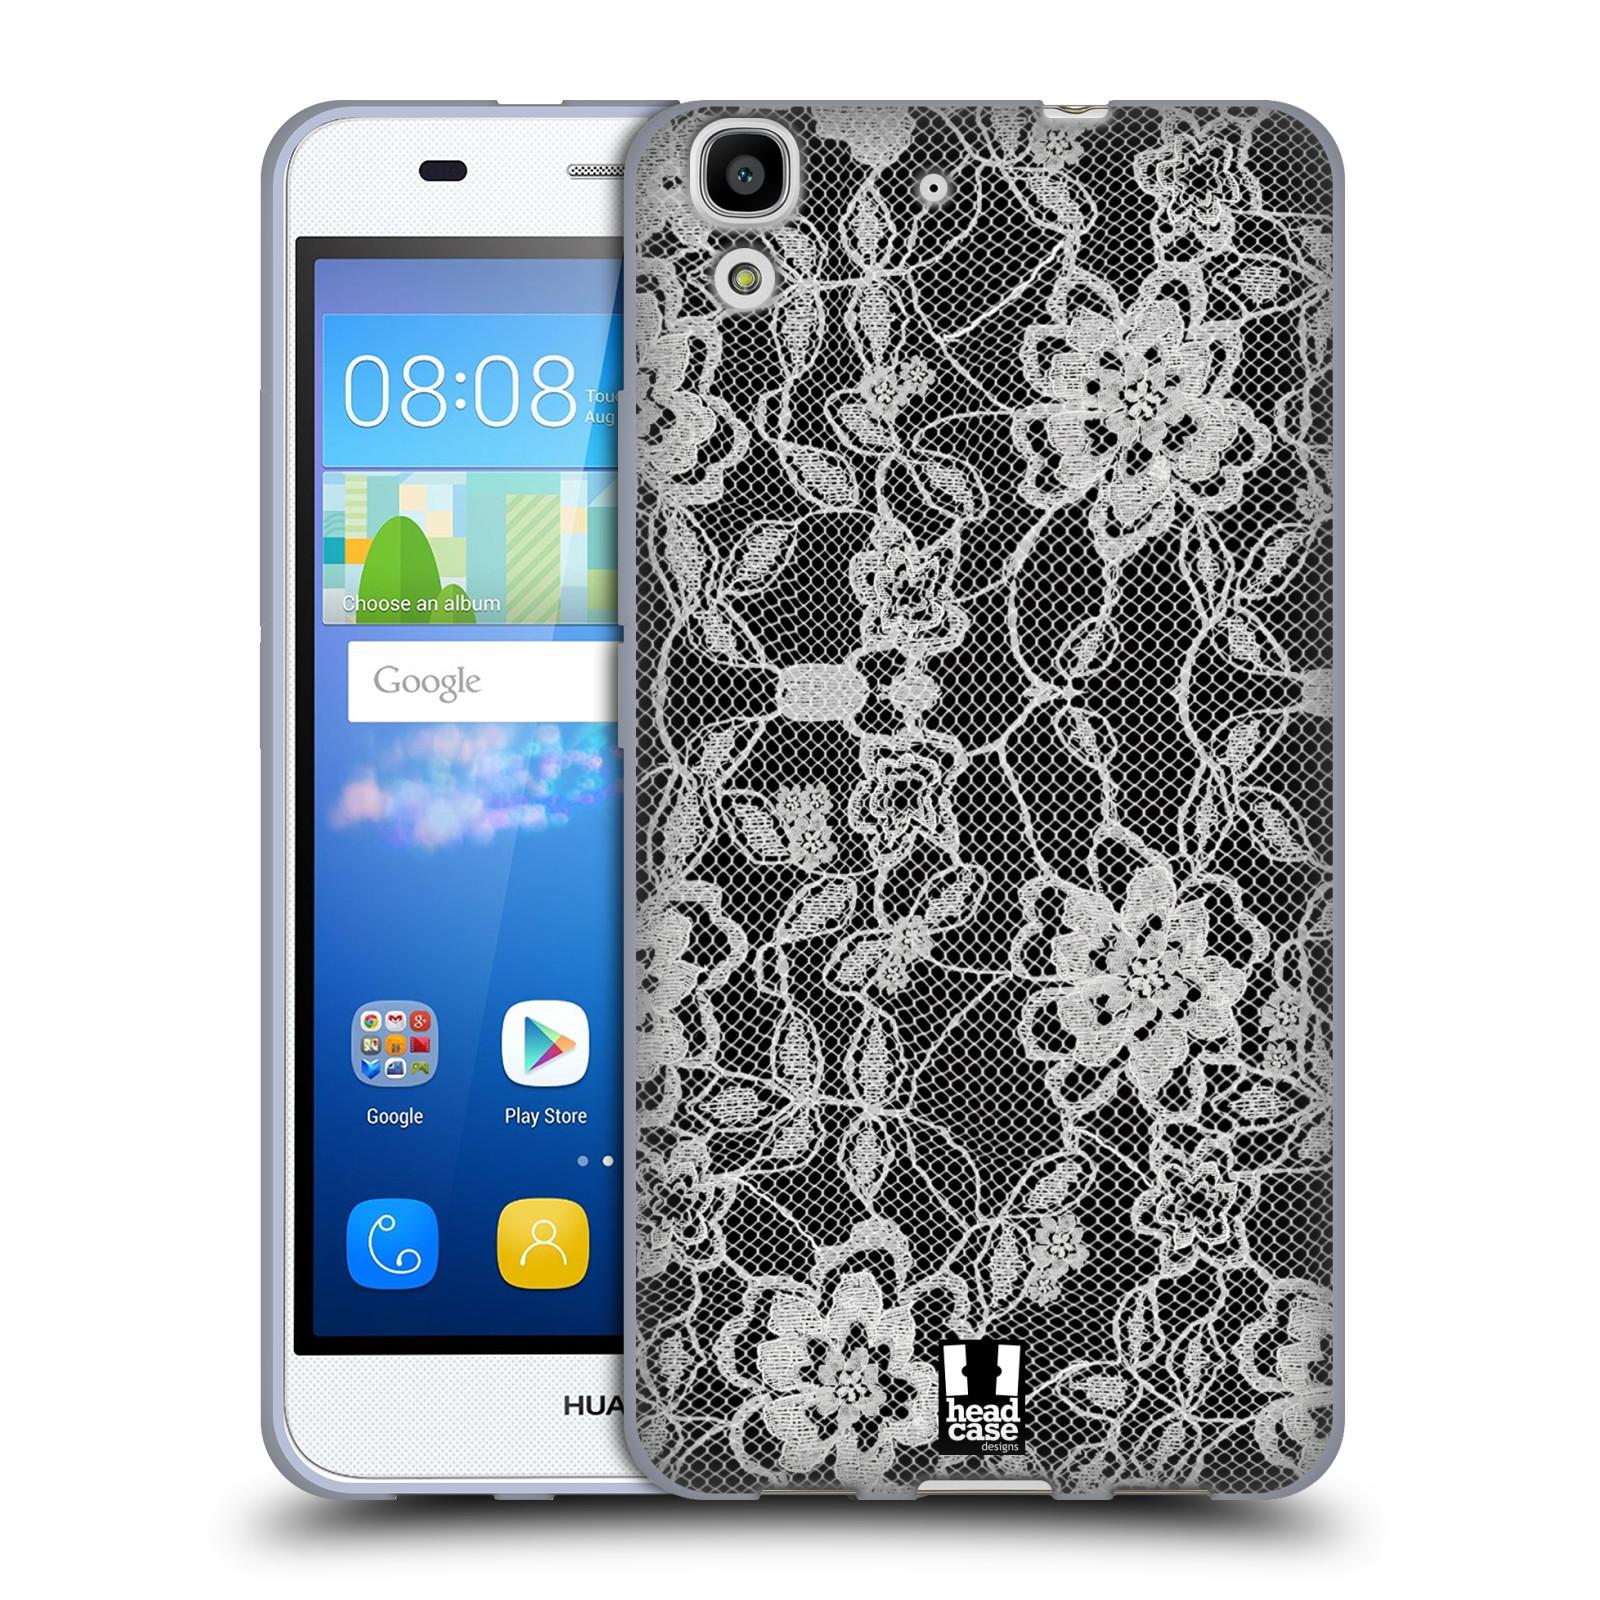 Silikonové pouzdro na mobil Huawei Y6 HEAD CASE FLOWERY KRAJKA